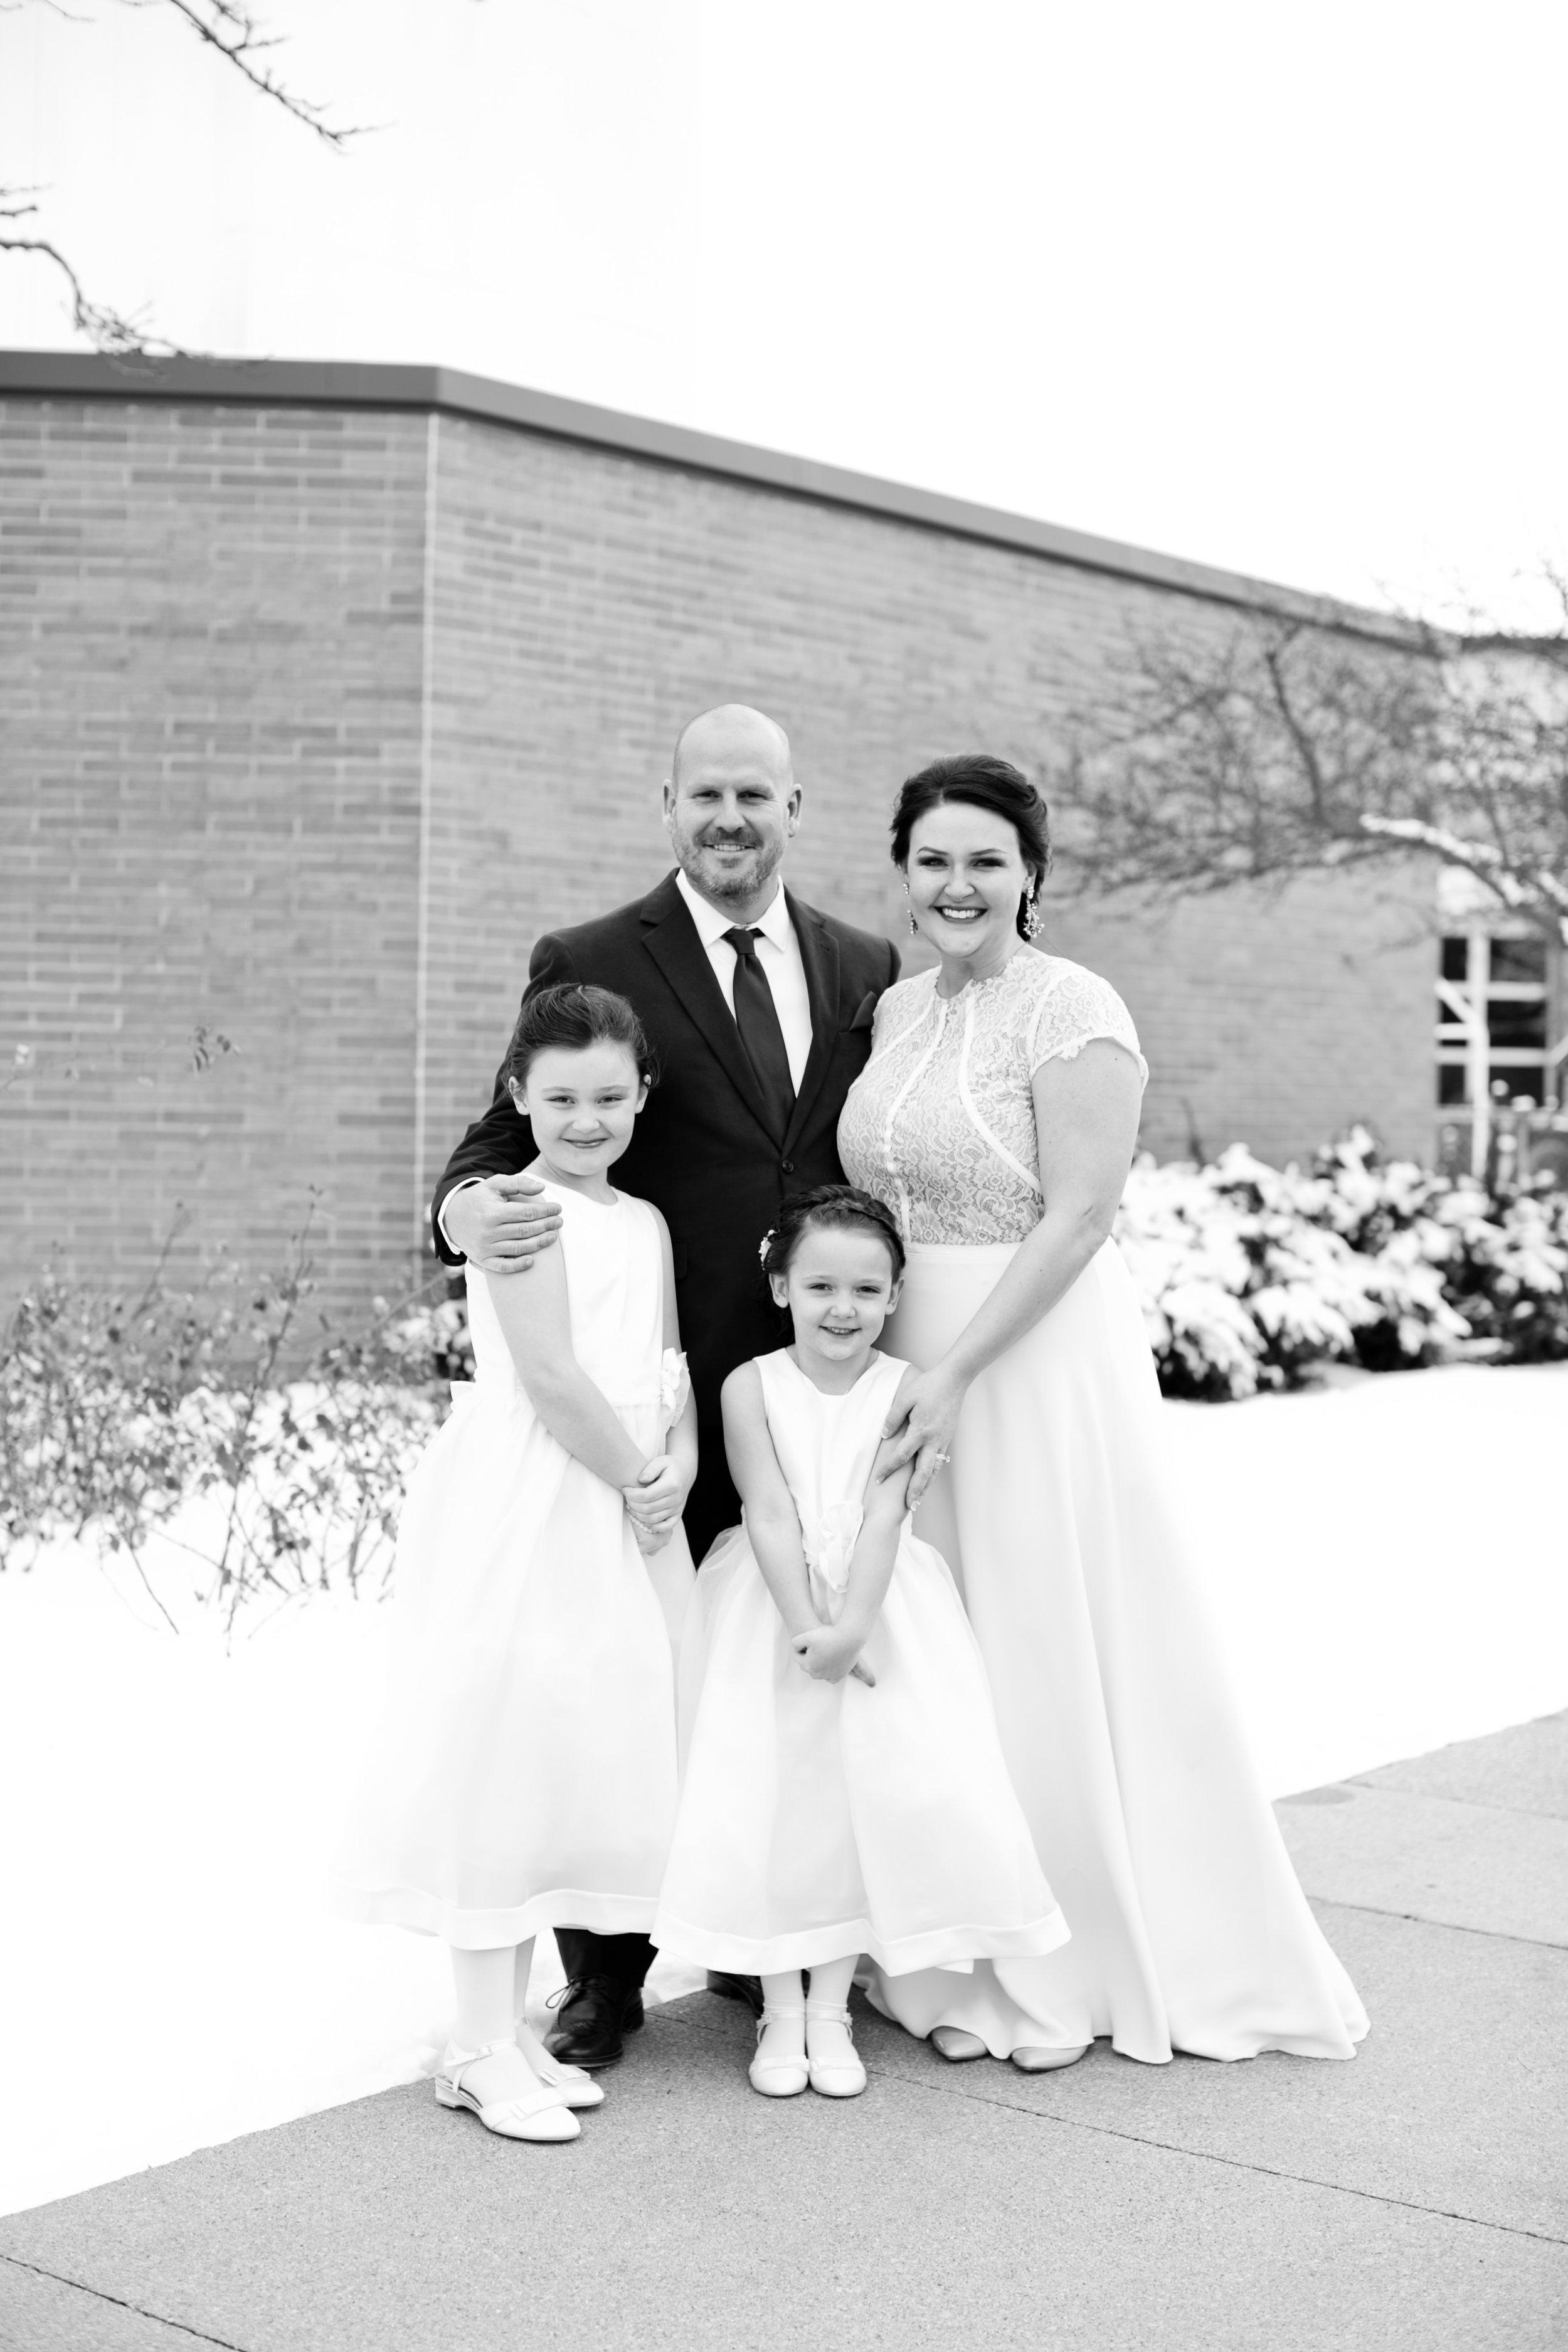 Juhl-wedding-79.jpg